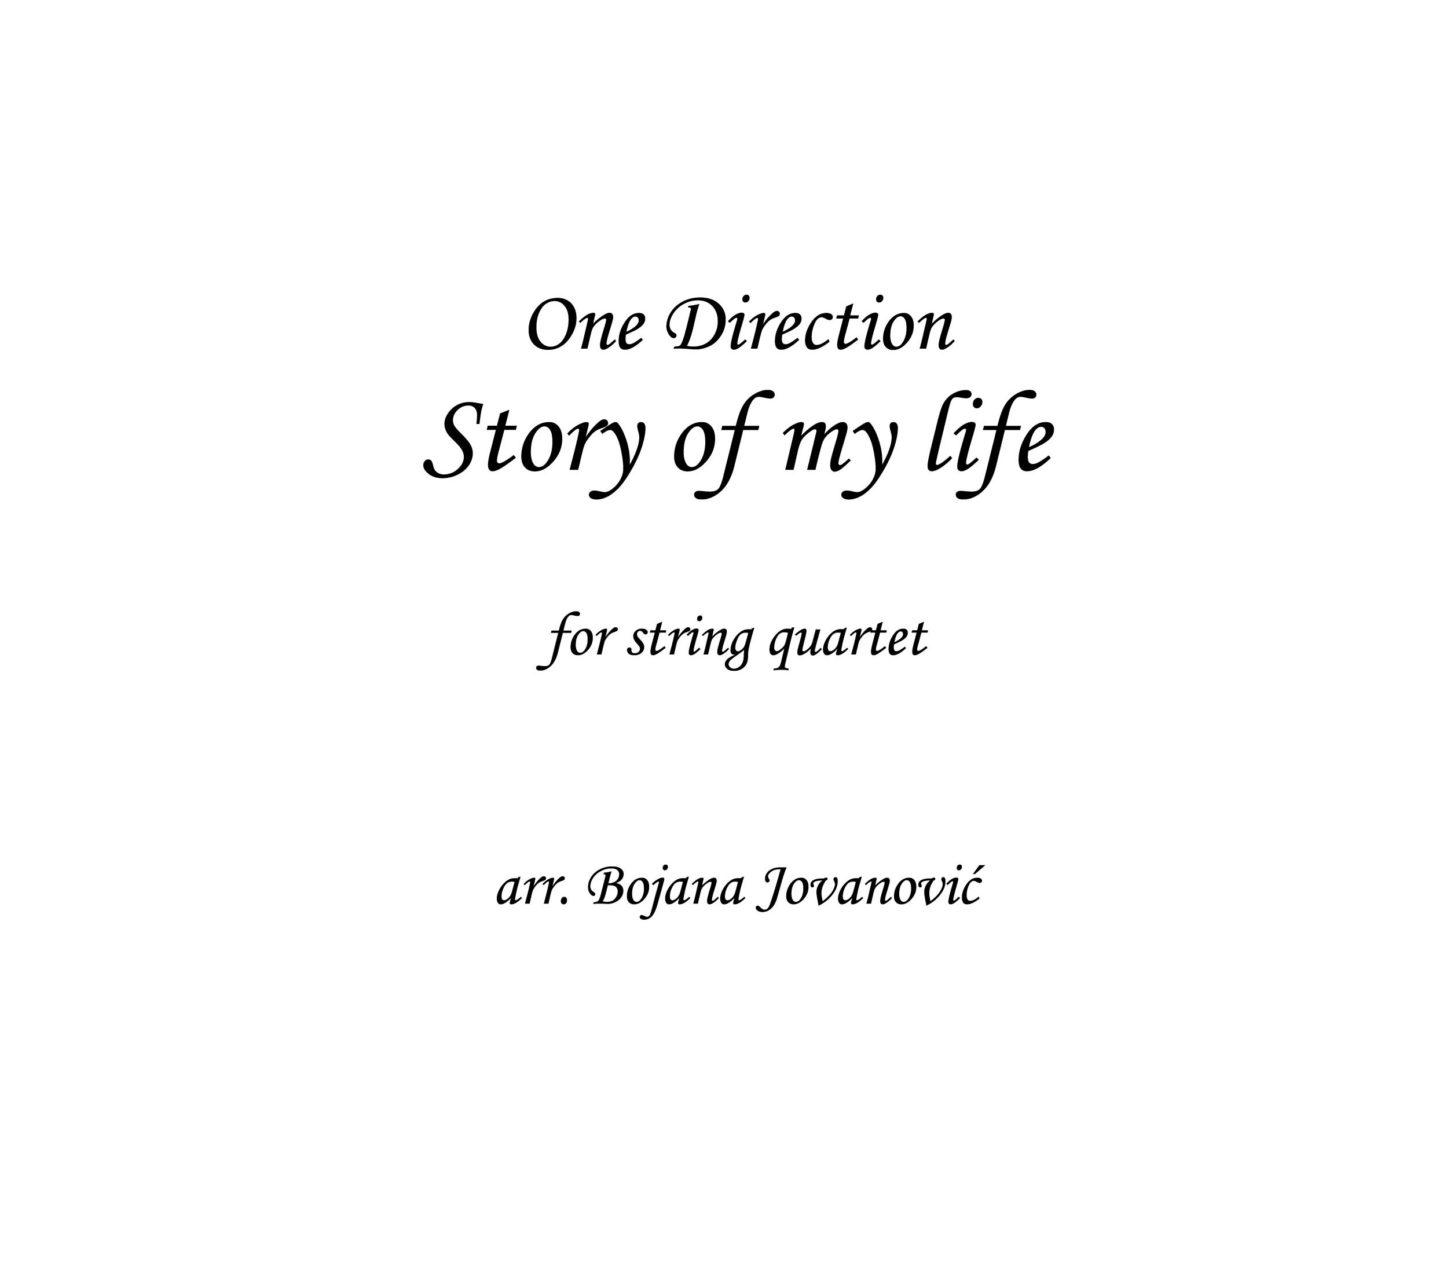 one direction sheet music pdf